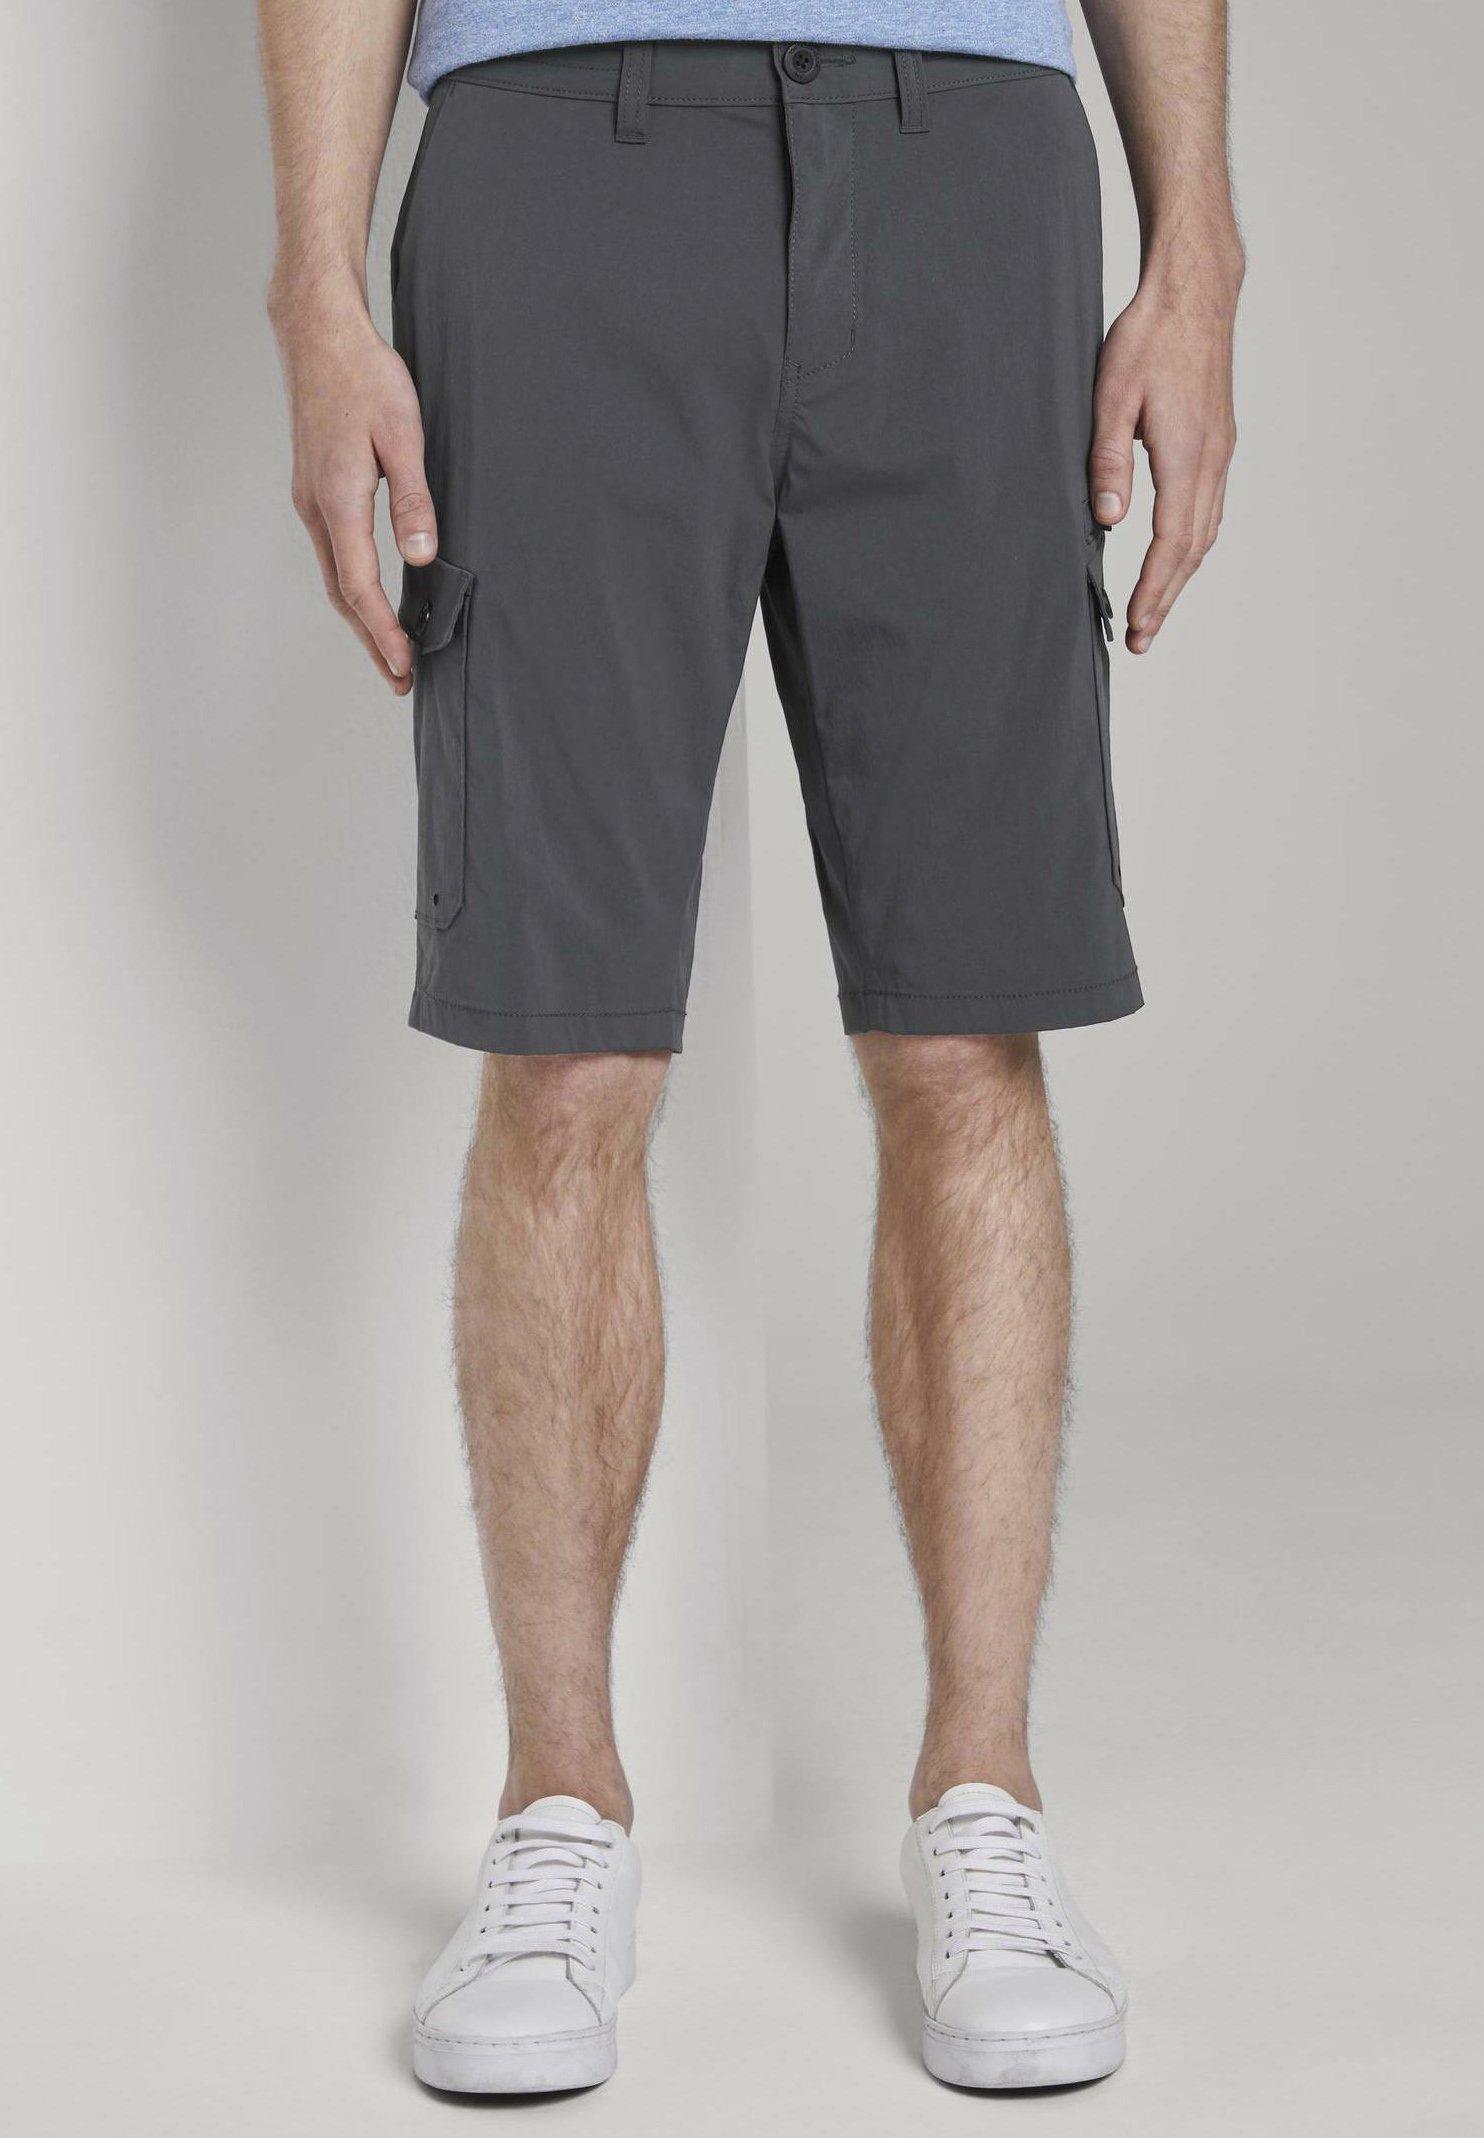 Homme HOSEN & CHINO FUNKTIONALE JOSH REGULAR SLIM CARGO-SHORTS - Short